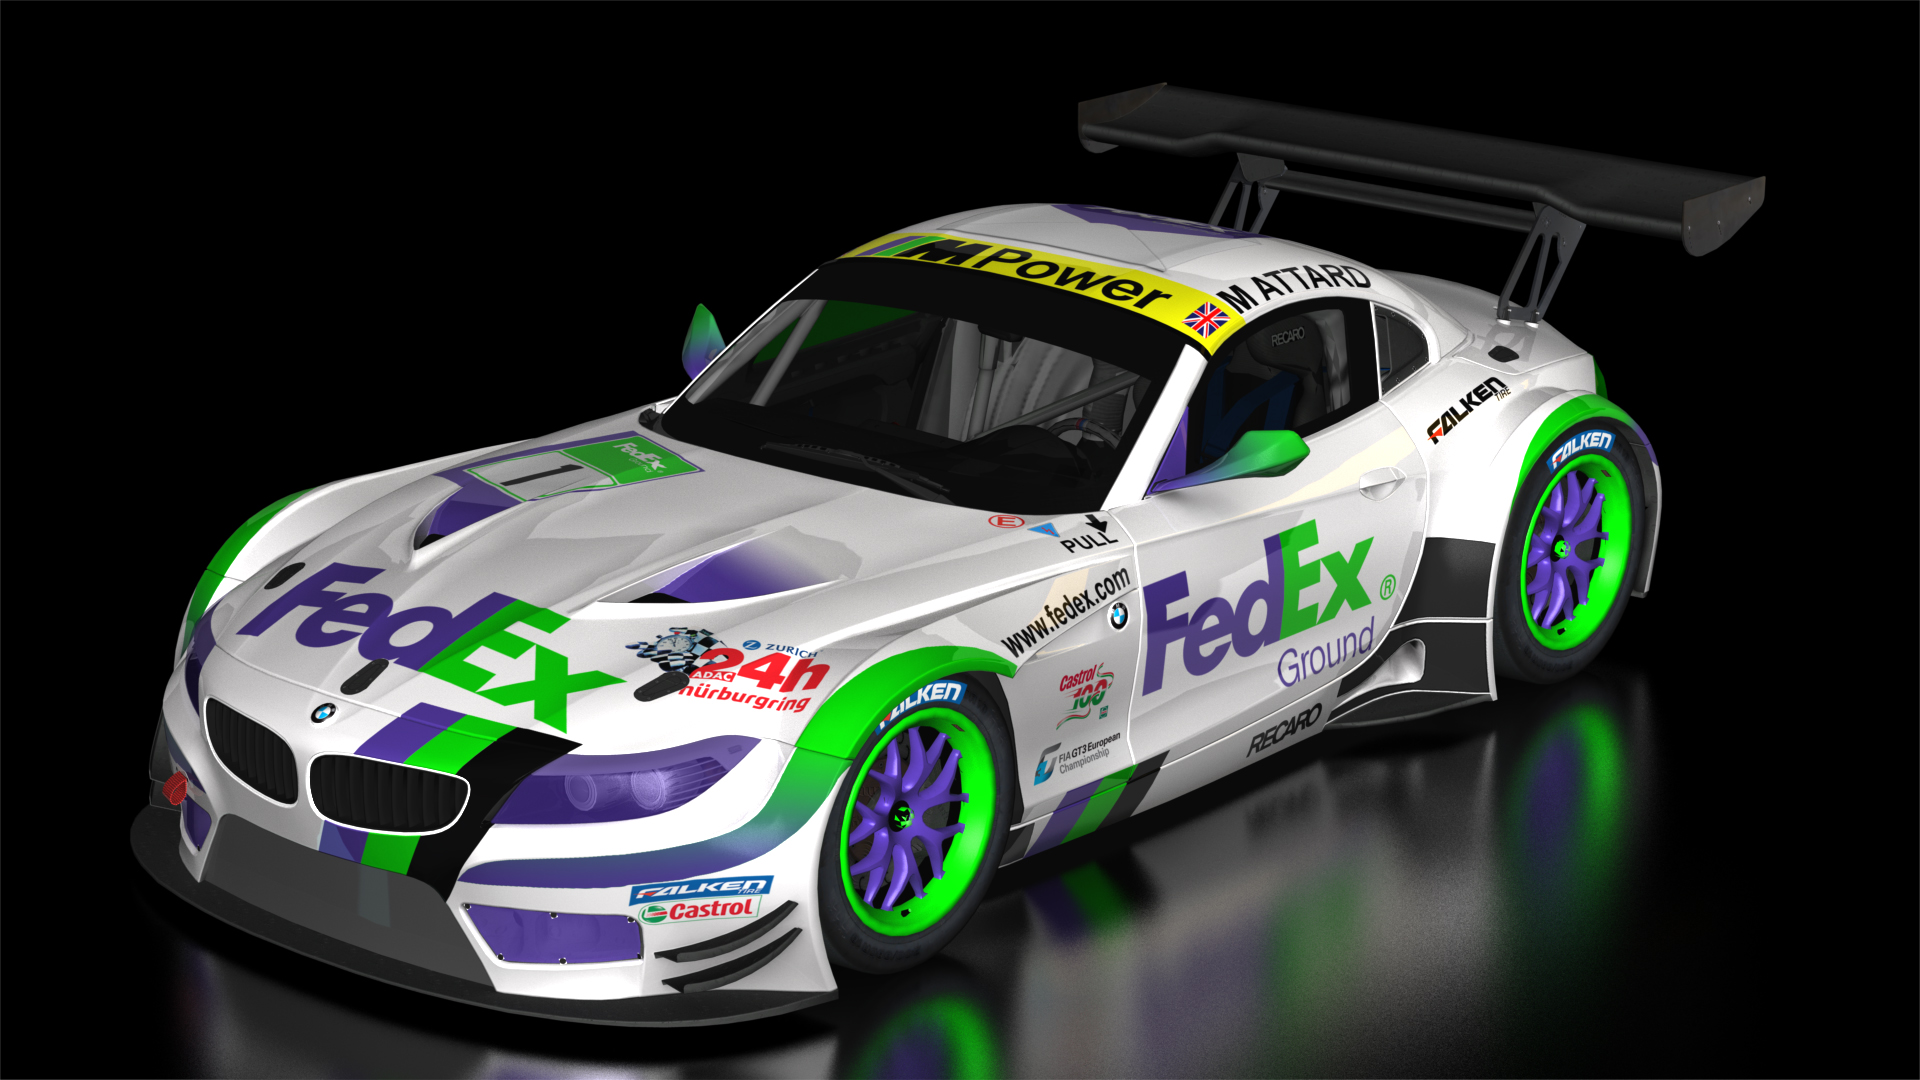 Bmw Gt3 Fedex Racing Team Livery Racedepartment